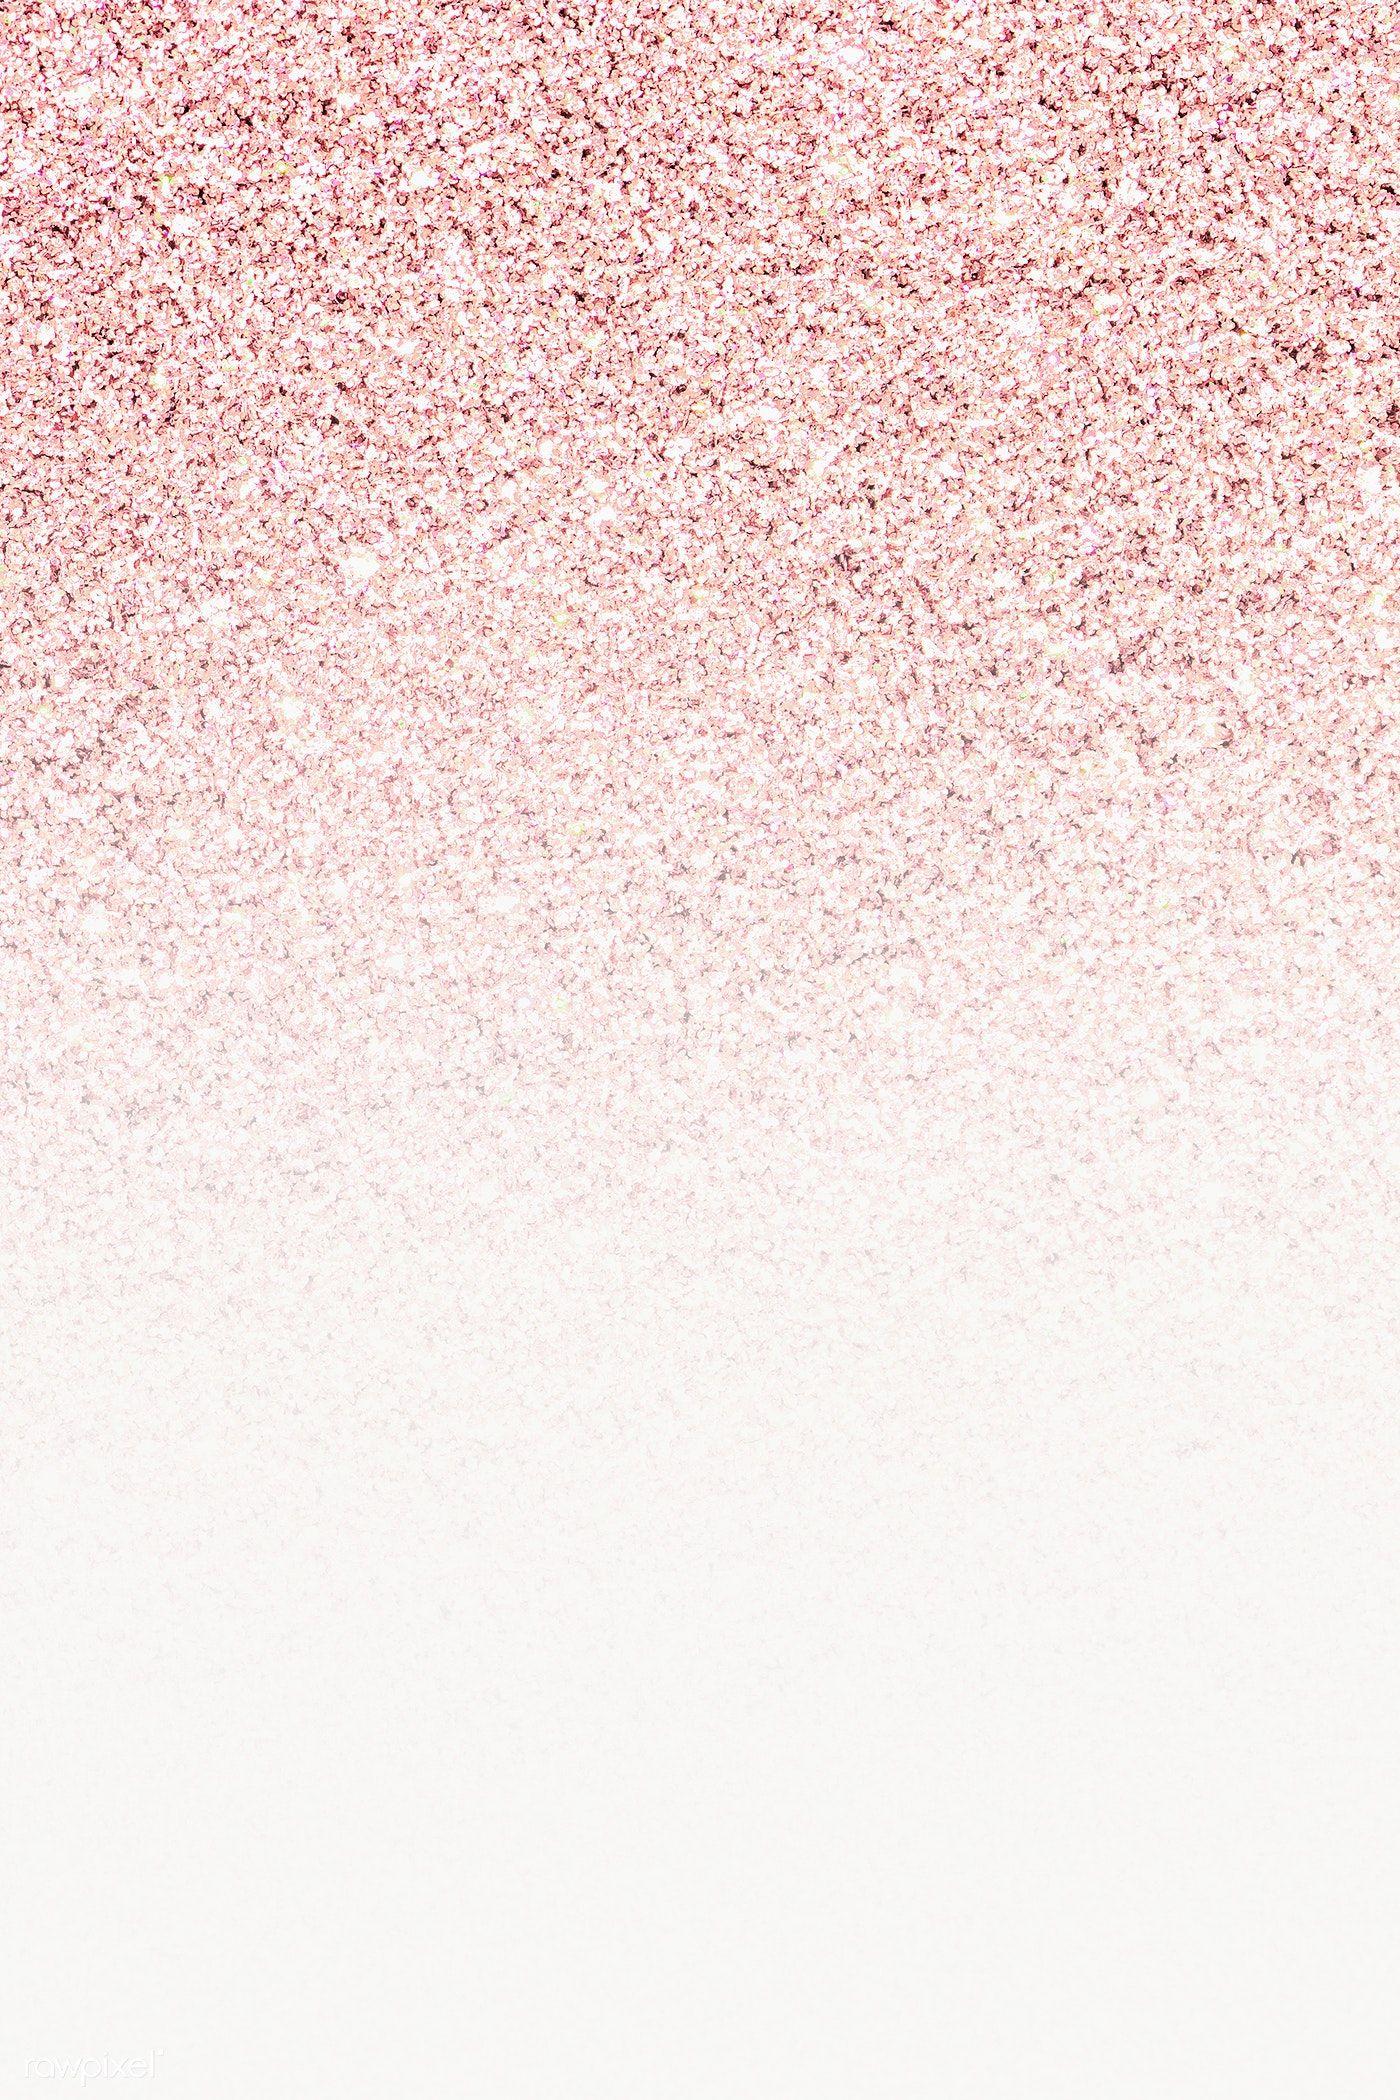 Pink Glitter Layer Transparent Png Premium Image By Rawpixel Com Ningzk V Pink Glitter Background Pink Glitter Wallpaper Glittery Wallpaper